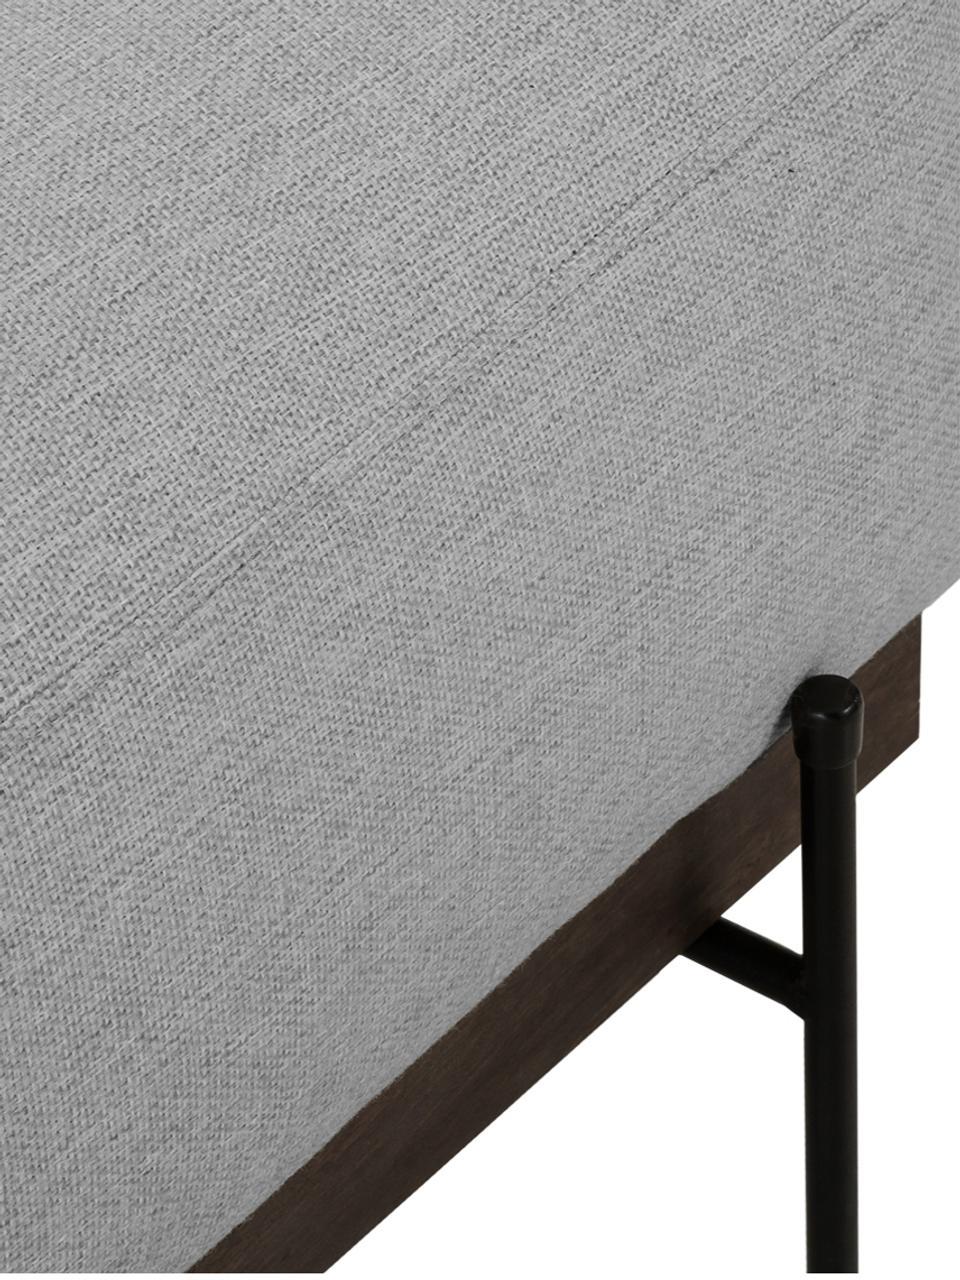 Sofa-Hocker Brooks in Grau mit Metall-Füßen, Bezug: Polyester 35.000 Scheuert, Gestell: Kiefernholz, massiv, Rahmen: Kiefernholz, lackiert, Füße: Metall, pulverbeschichtet, Grau, 80 x 43 cm